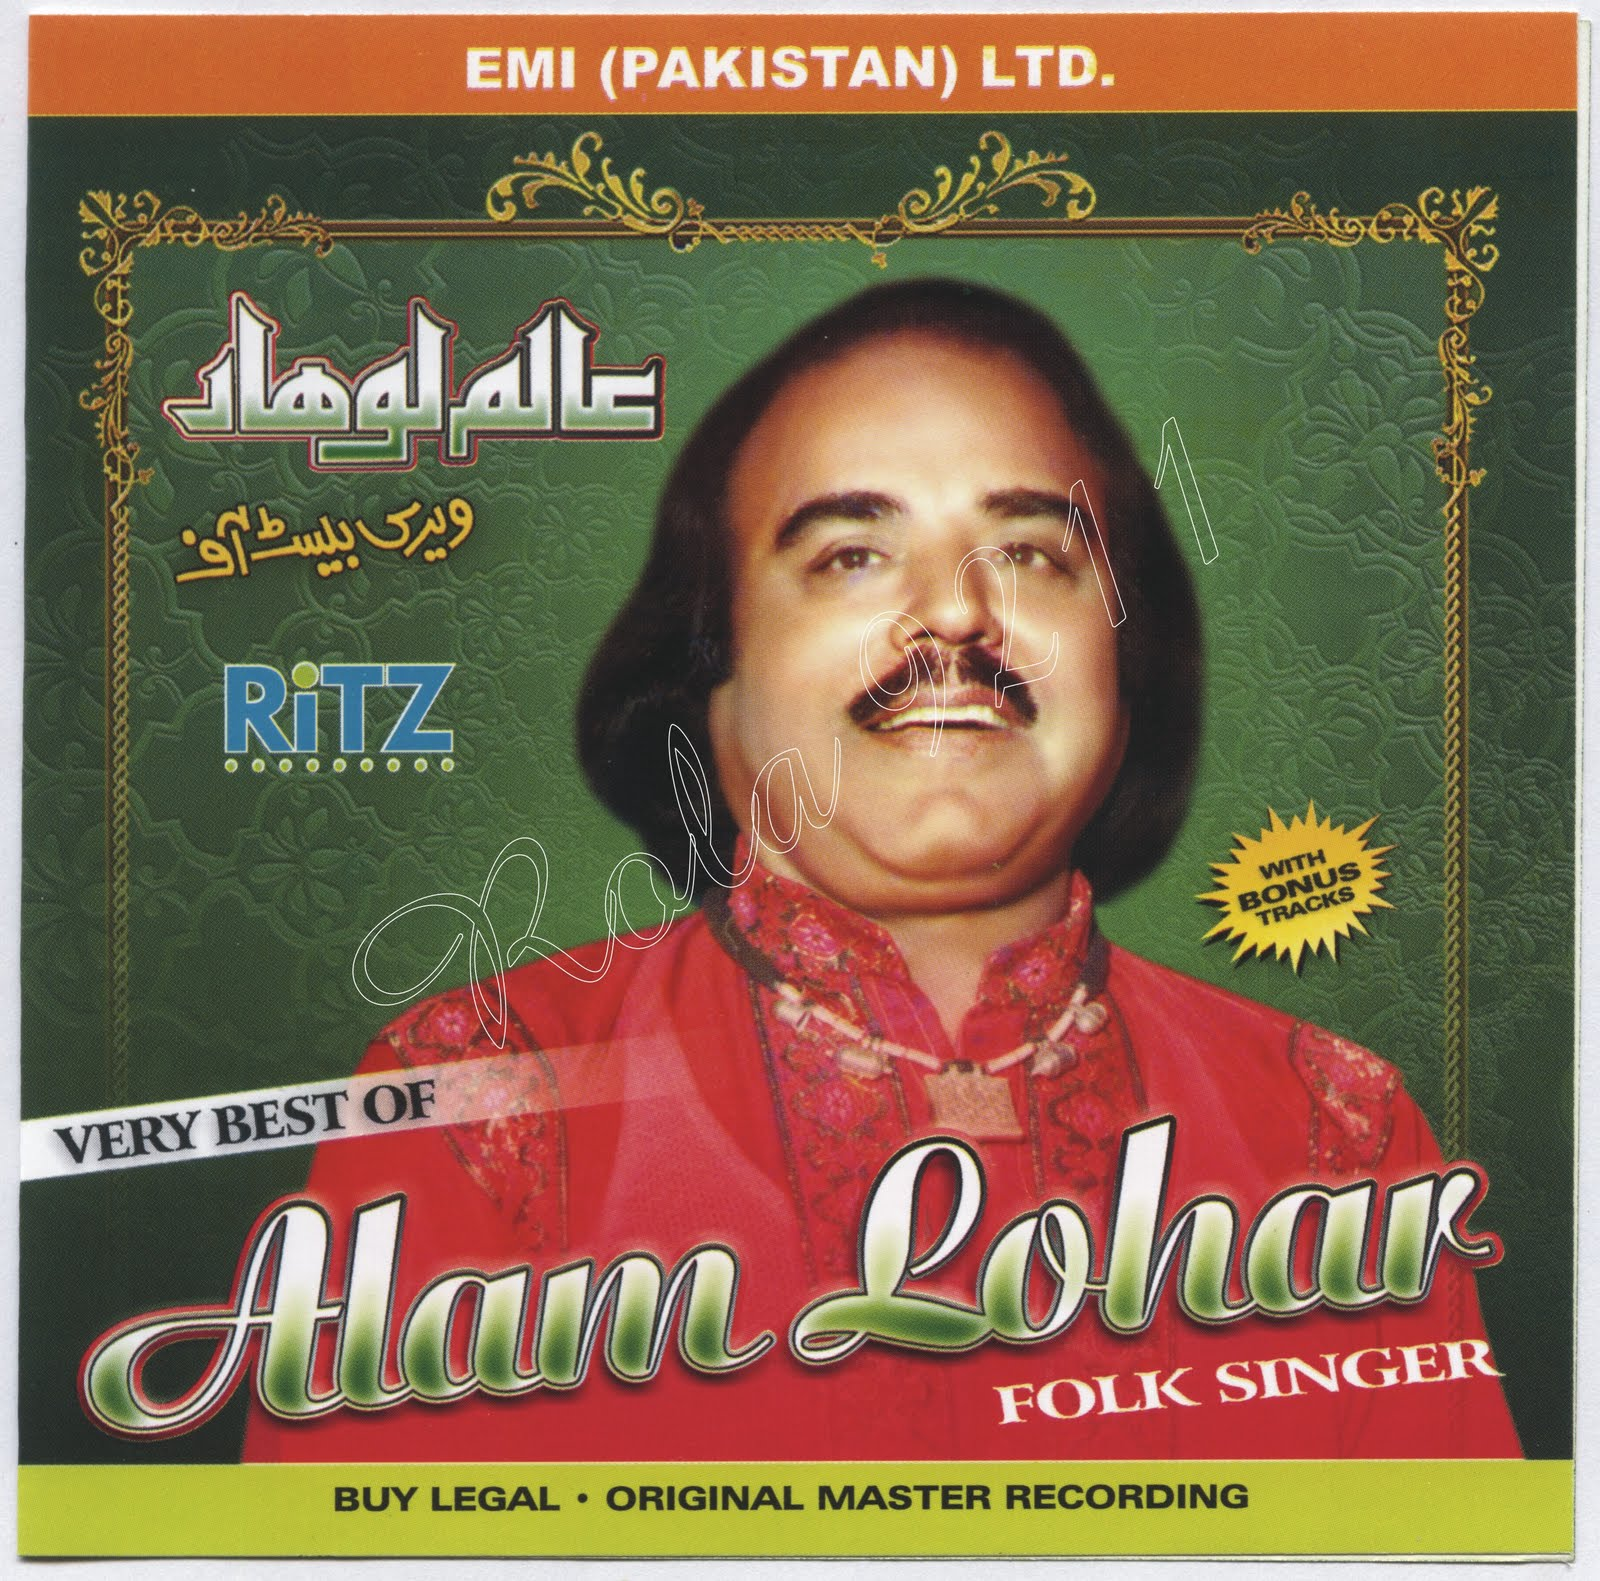 Alam lohar video songs free download